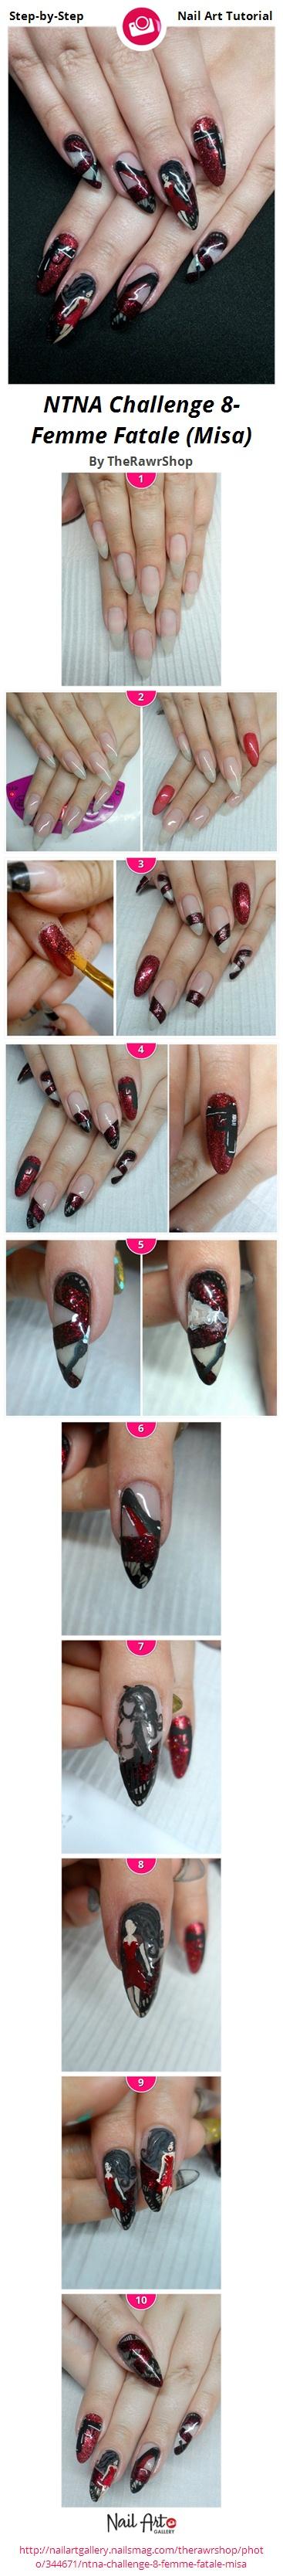 NTNA Challenge 8- Femme Fatale (Misa) - Nail Art Gallery